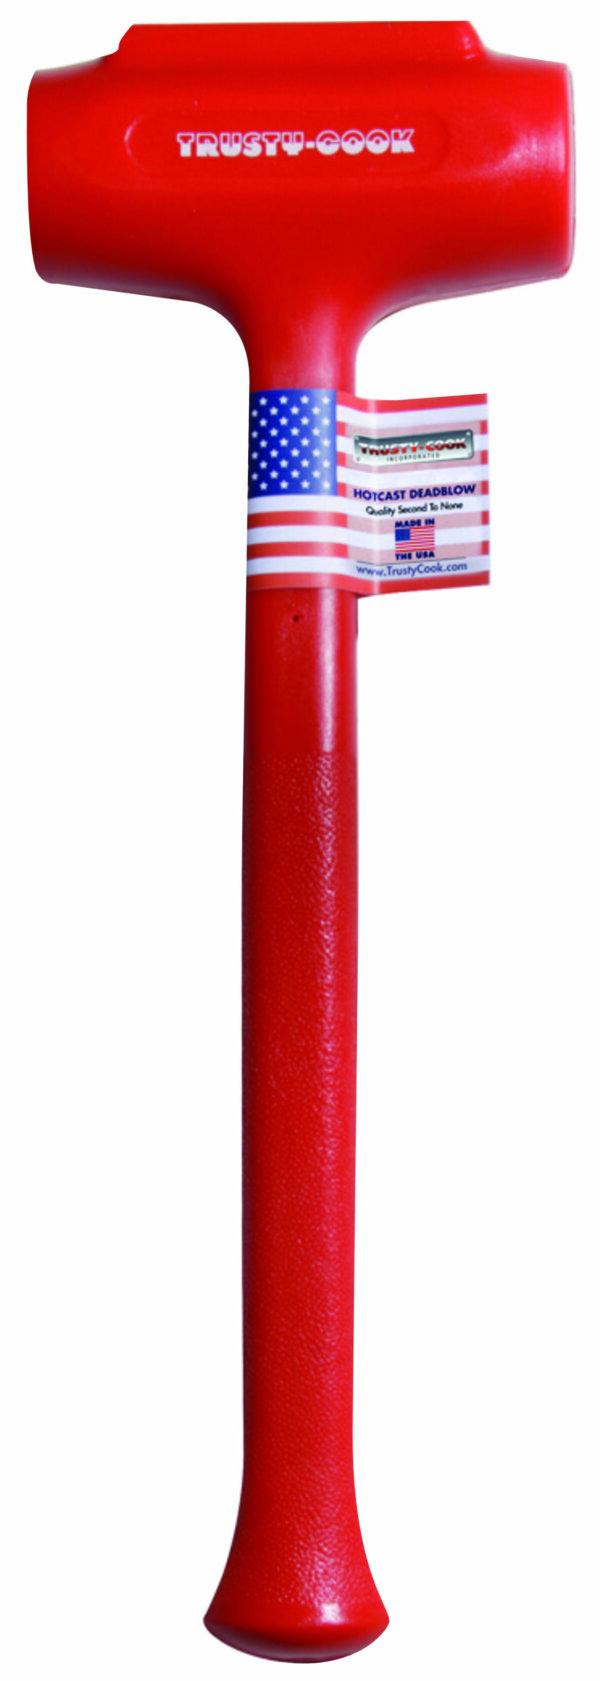 88 oz. Soft Face Polyurethane Dead Blow Sledge Hammer